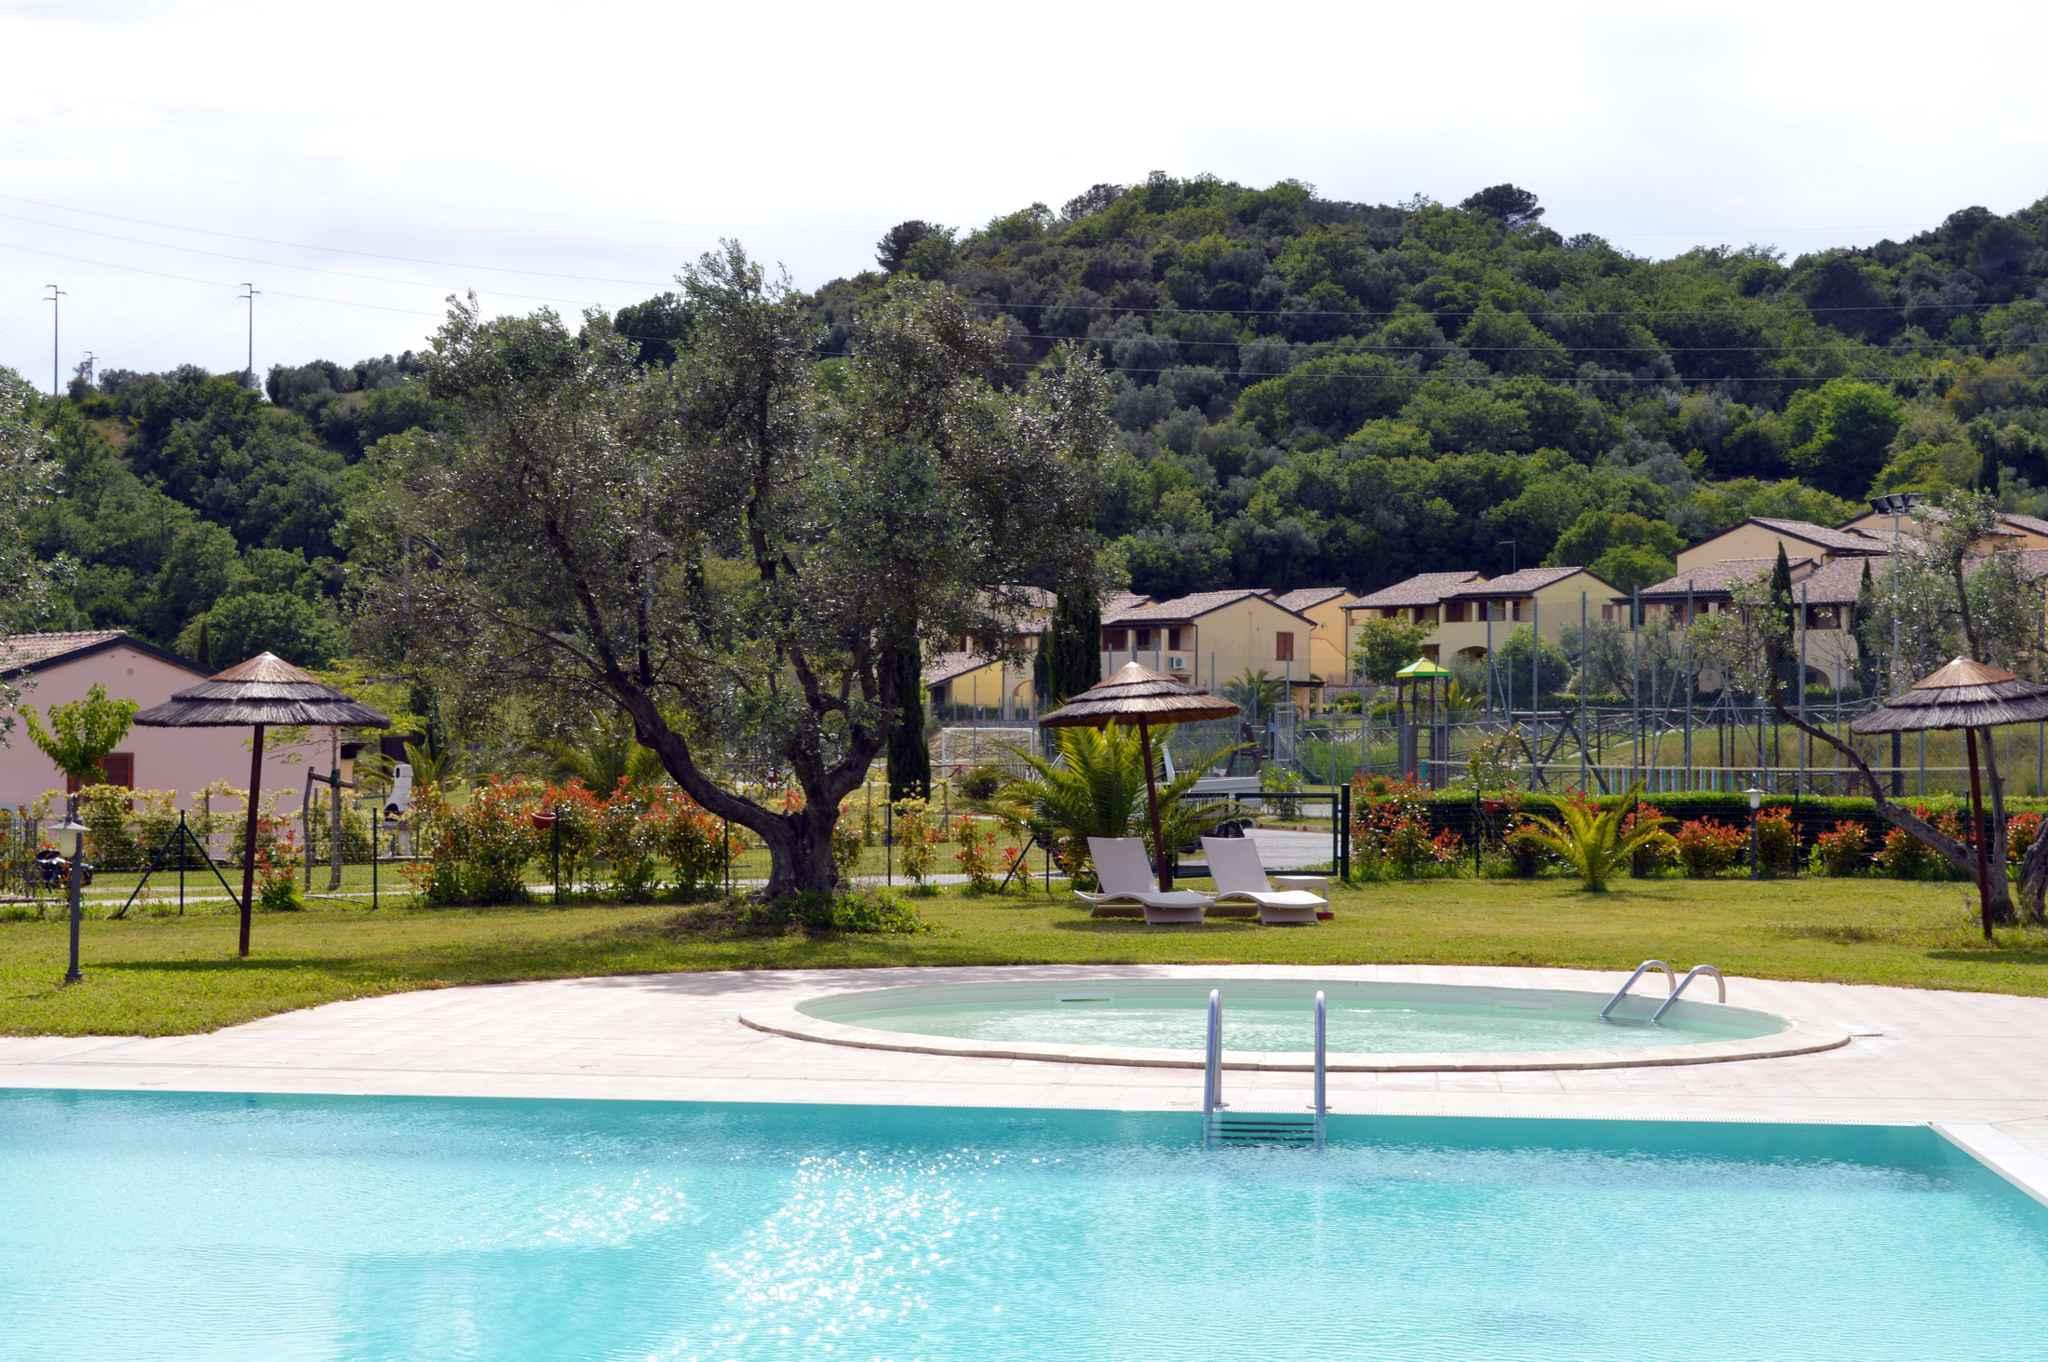 Ferienwohnung with Pool (1710369), Suvereto, Livorno, Toskana, Italien, Bild 6